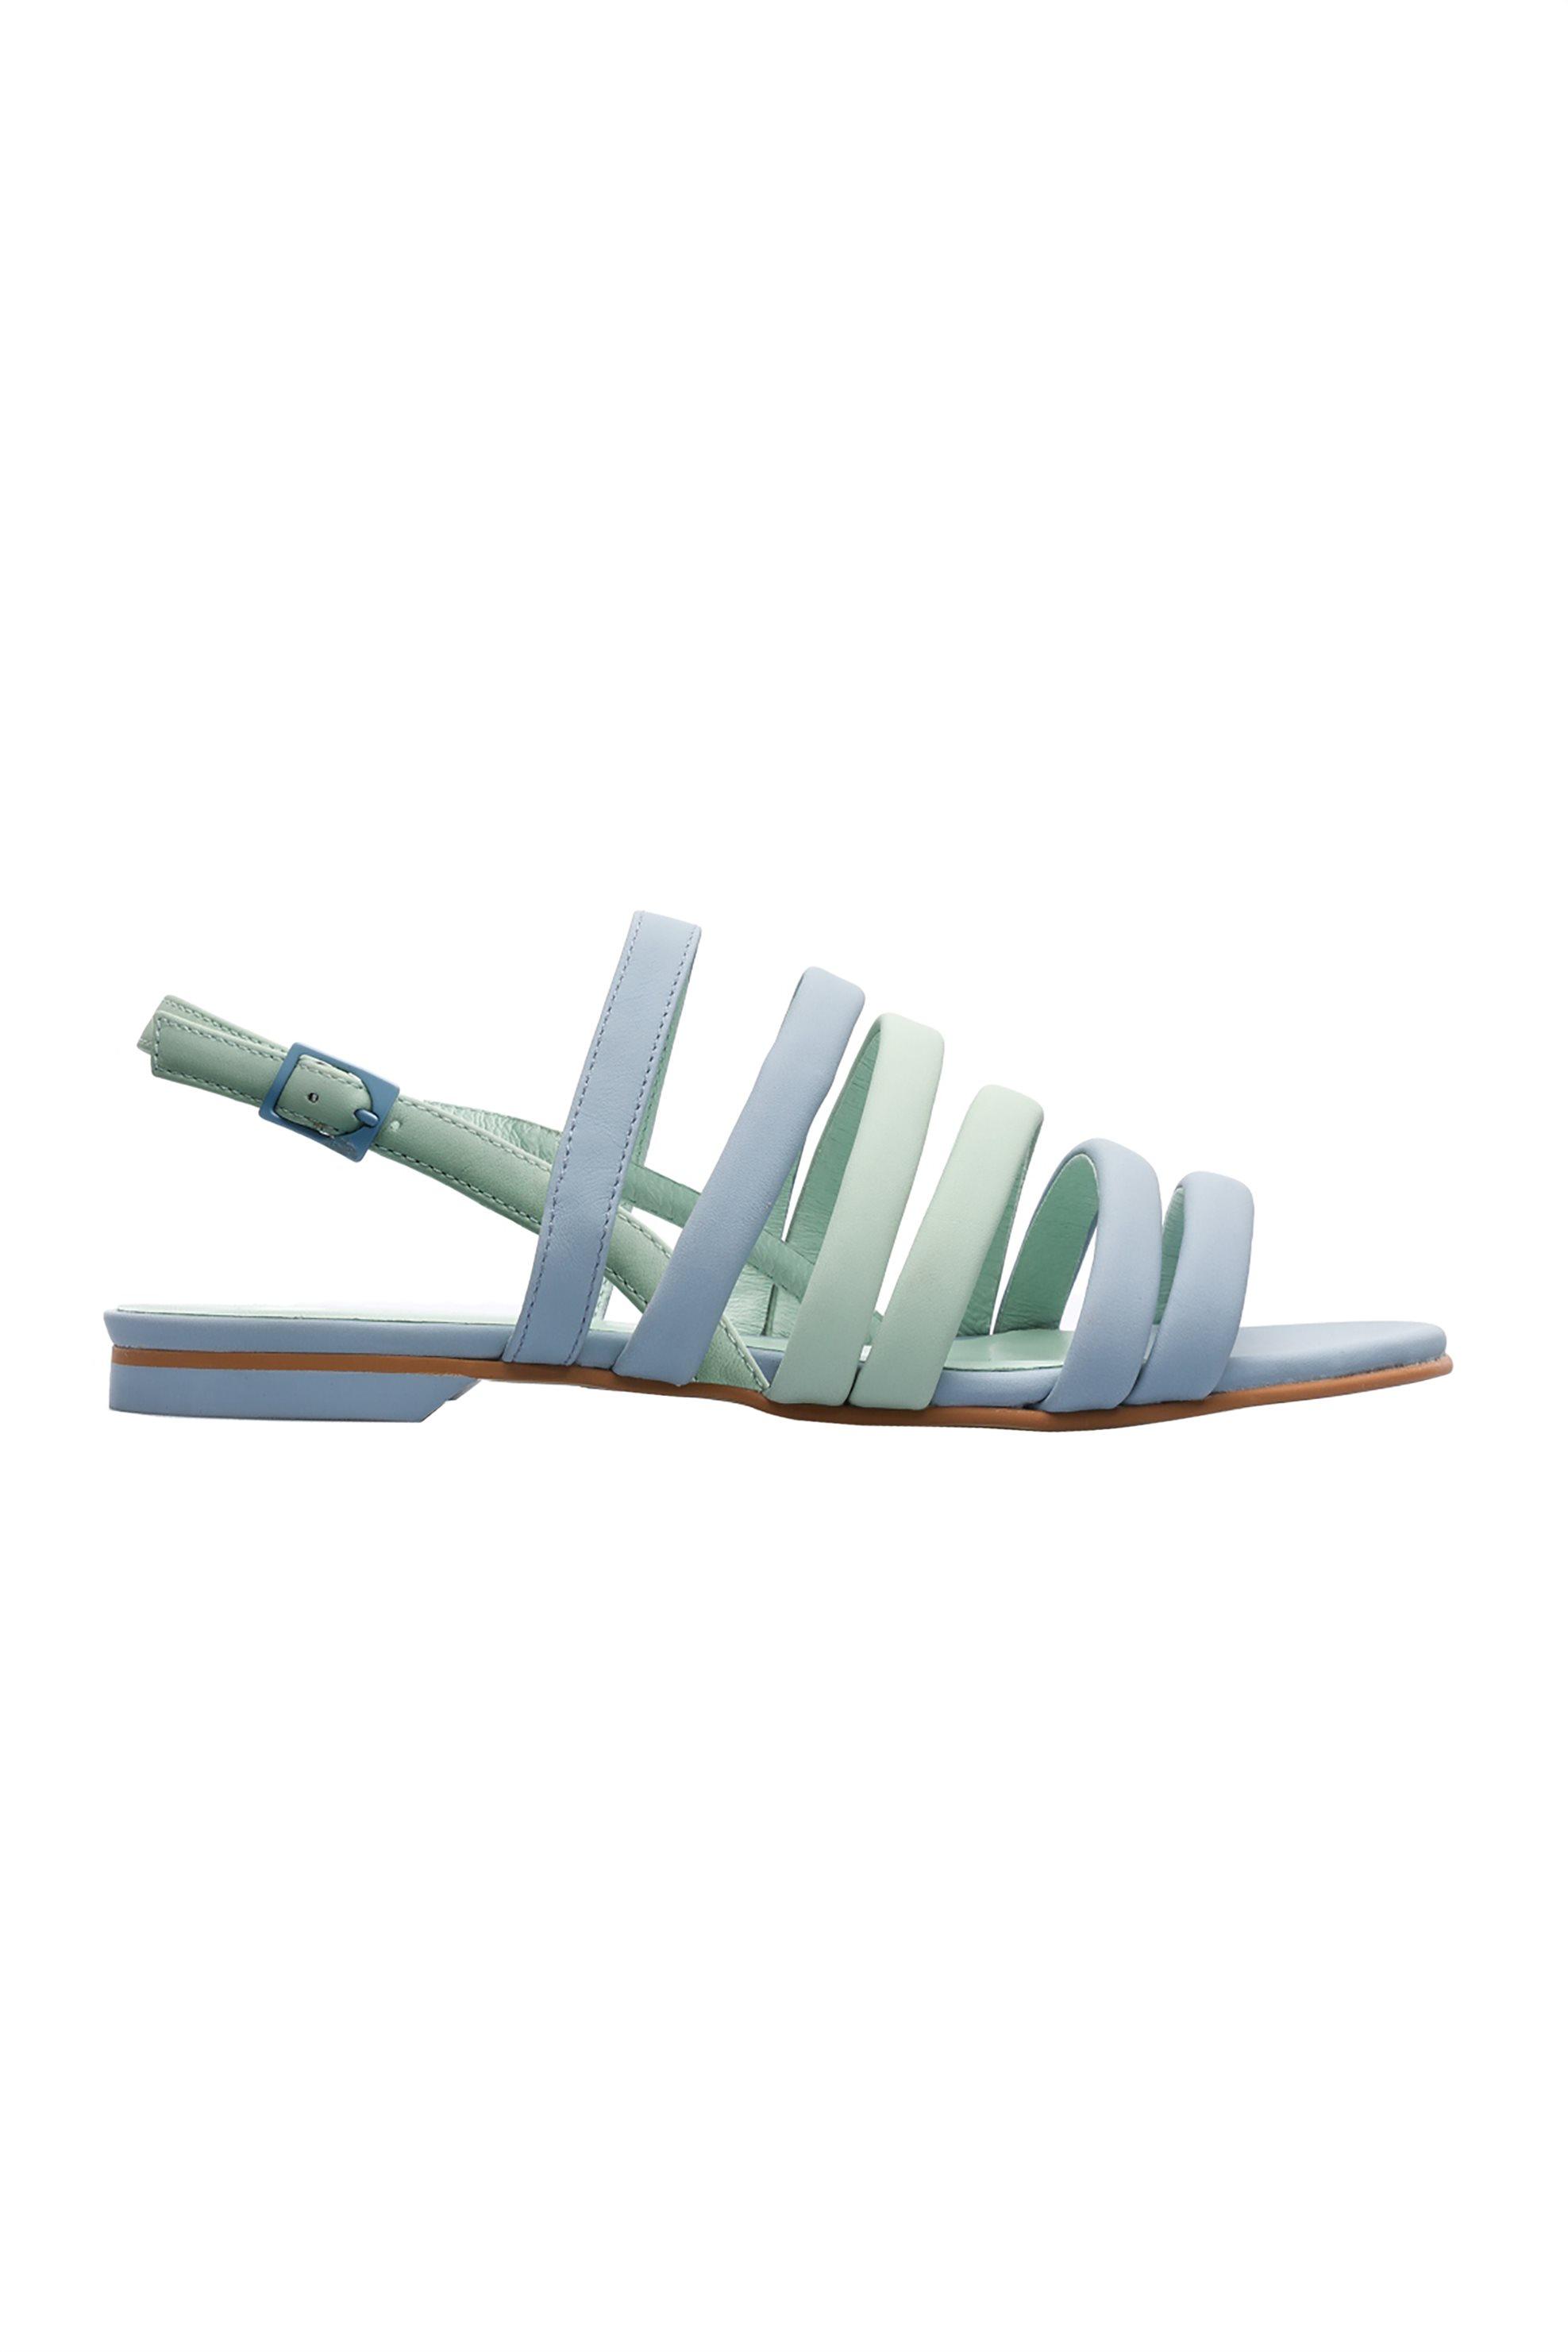 101066ef334 -15% Notos Camper γυναικεία φλατ σανδάλια με λουριά Twins – K200800-002 –  Γαλάζιο